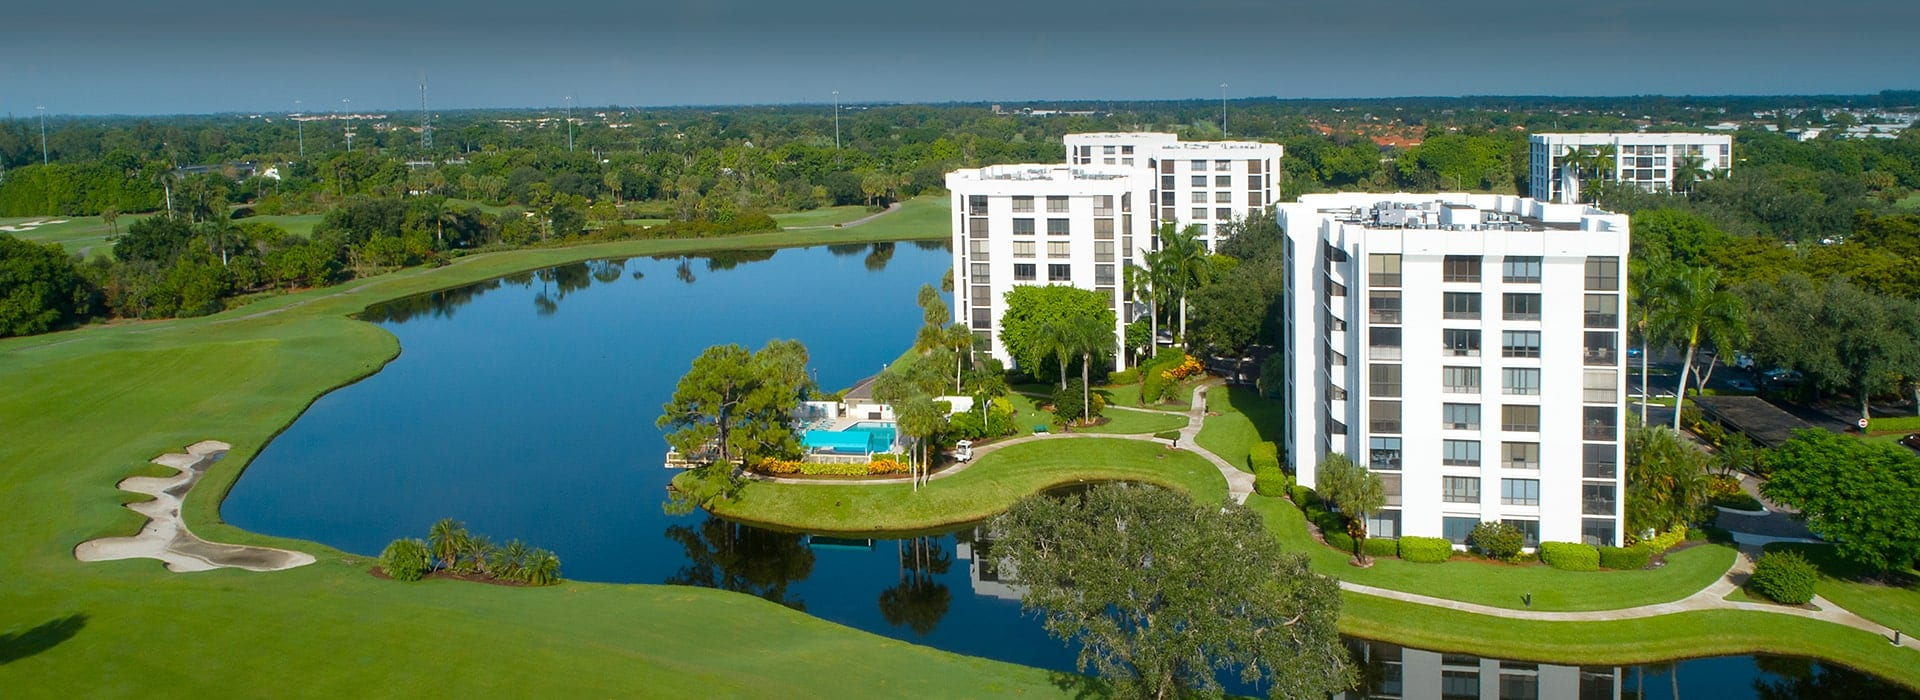 Lakewood MidRise condominium residences at Boca West